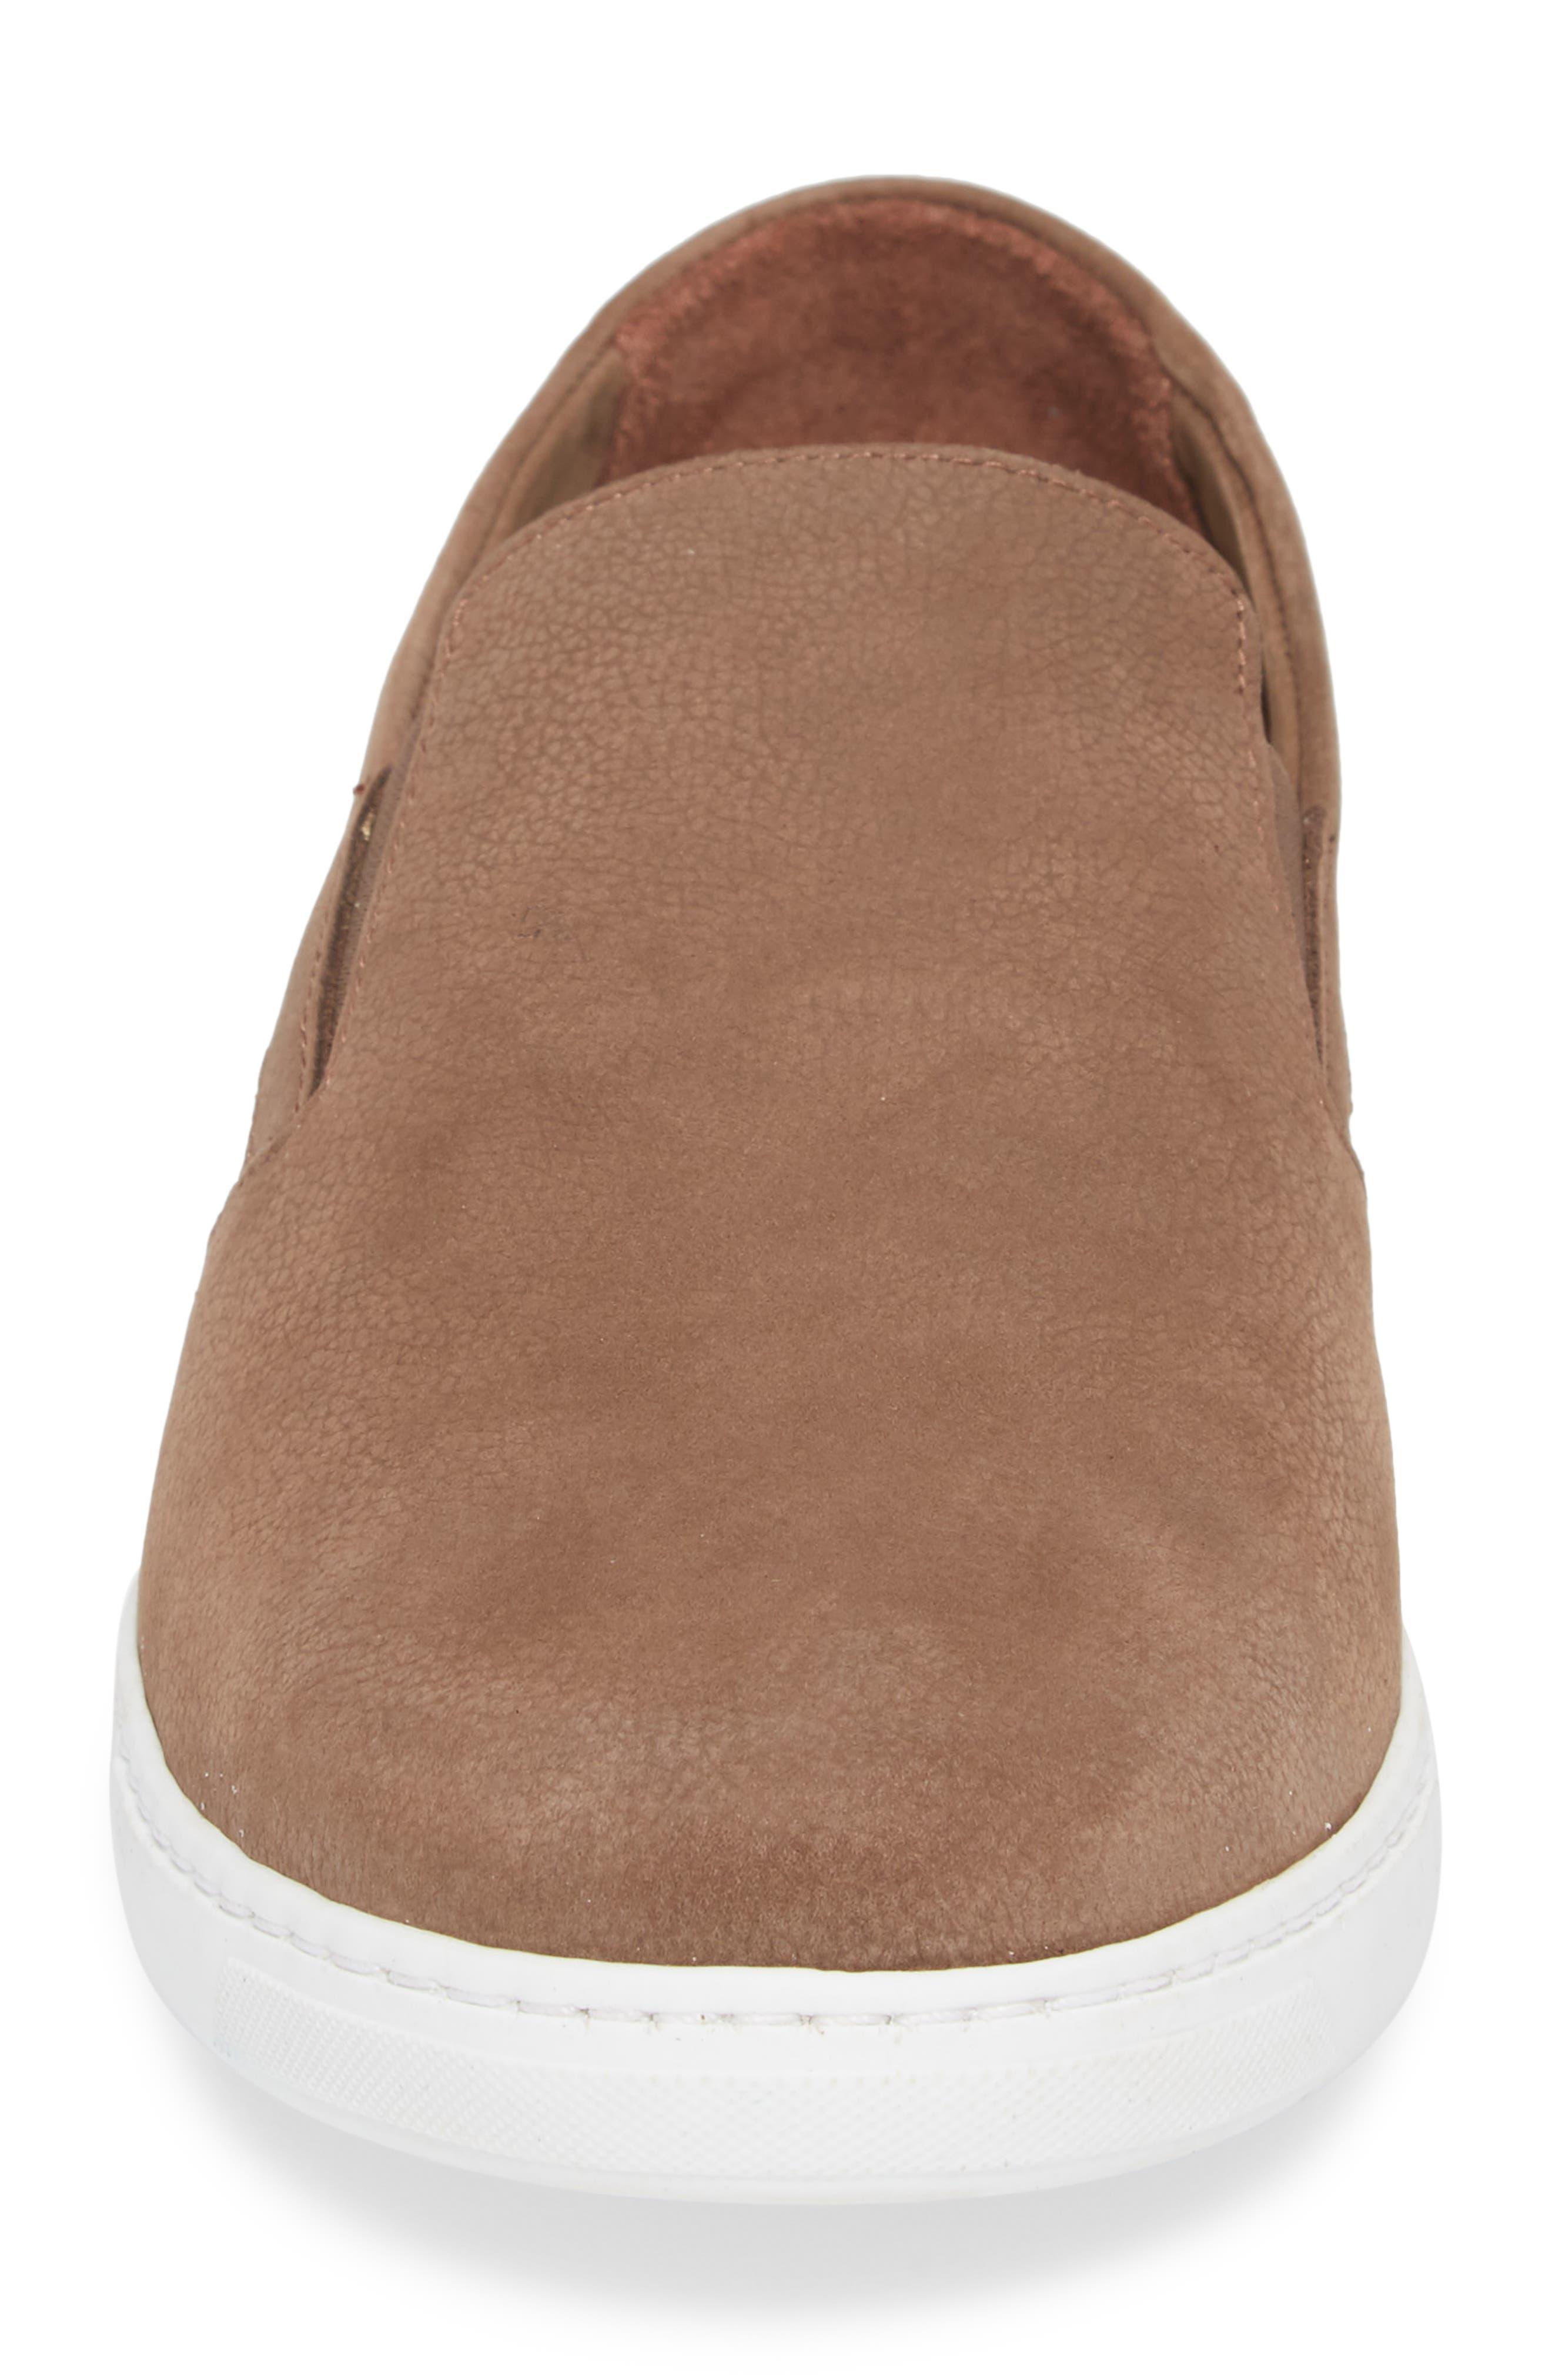 Neff Slip-On Sneaker,                             Alternate thumbnail 4, color,                             Taupe Leather